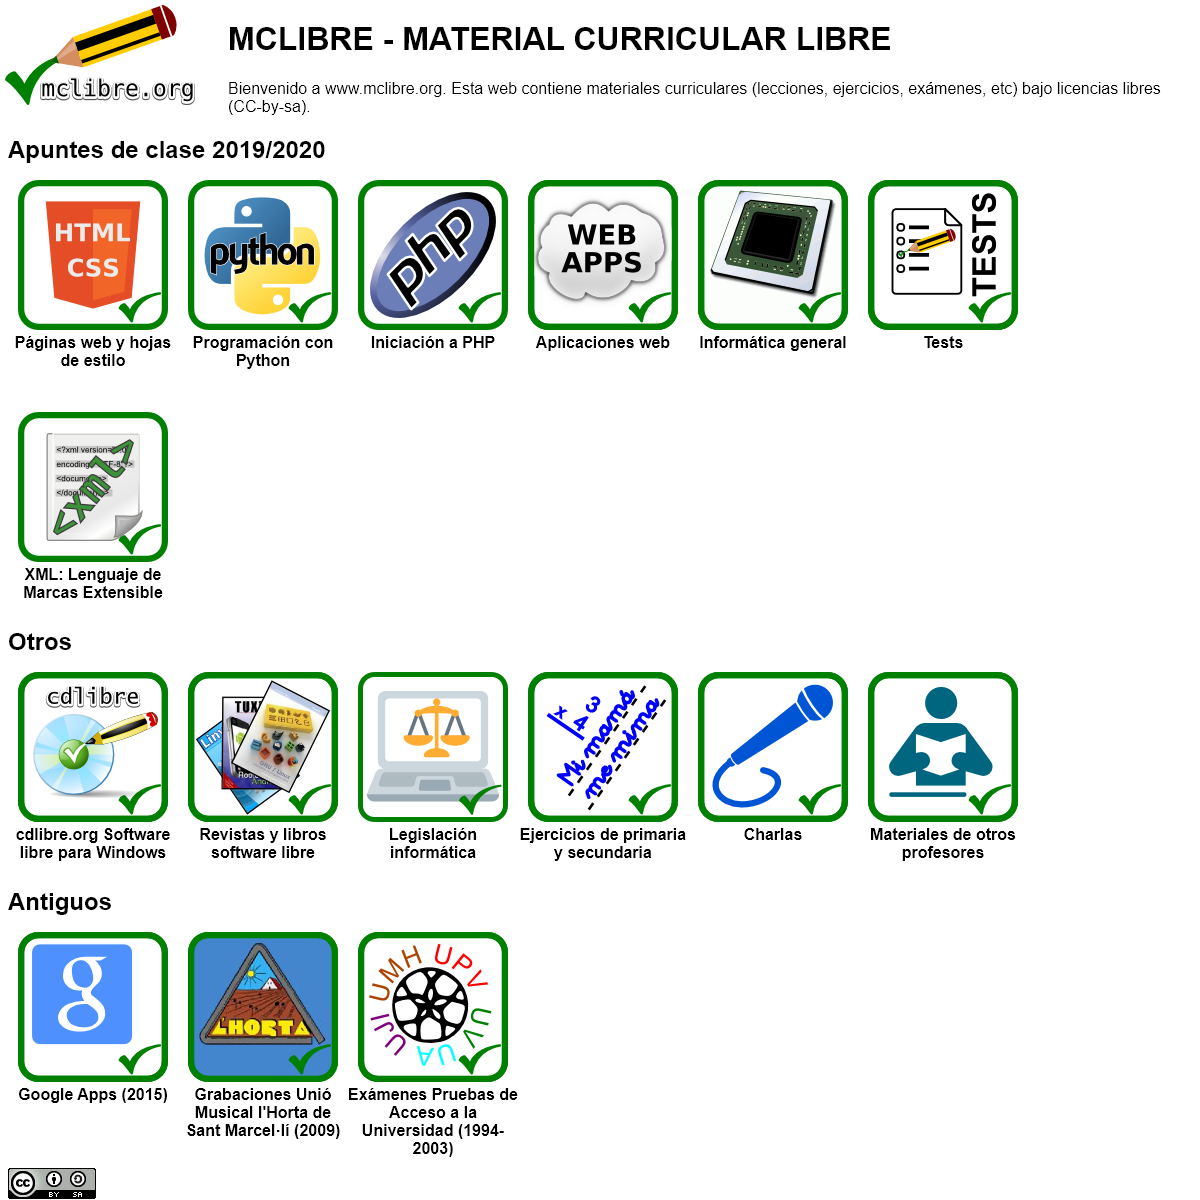 Material Curricular Libre - www.mclibre.org